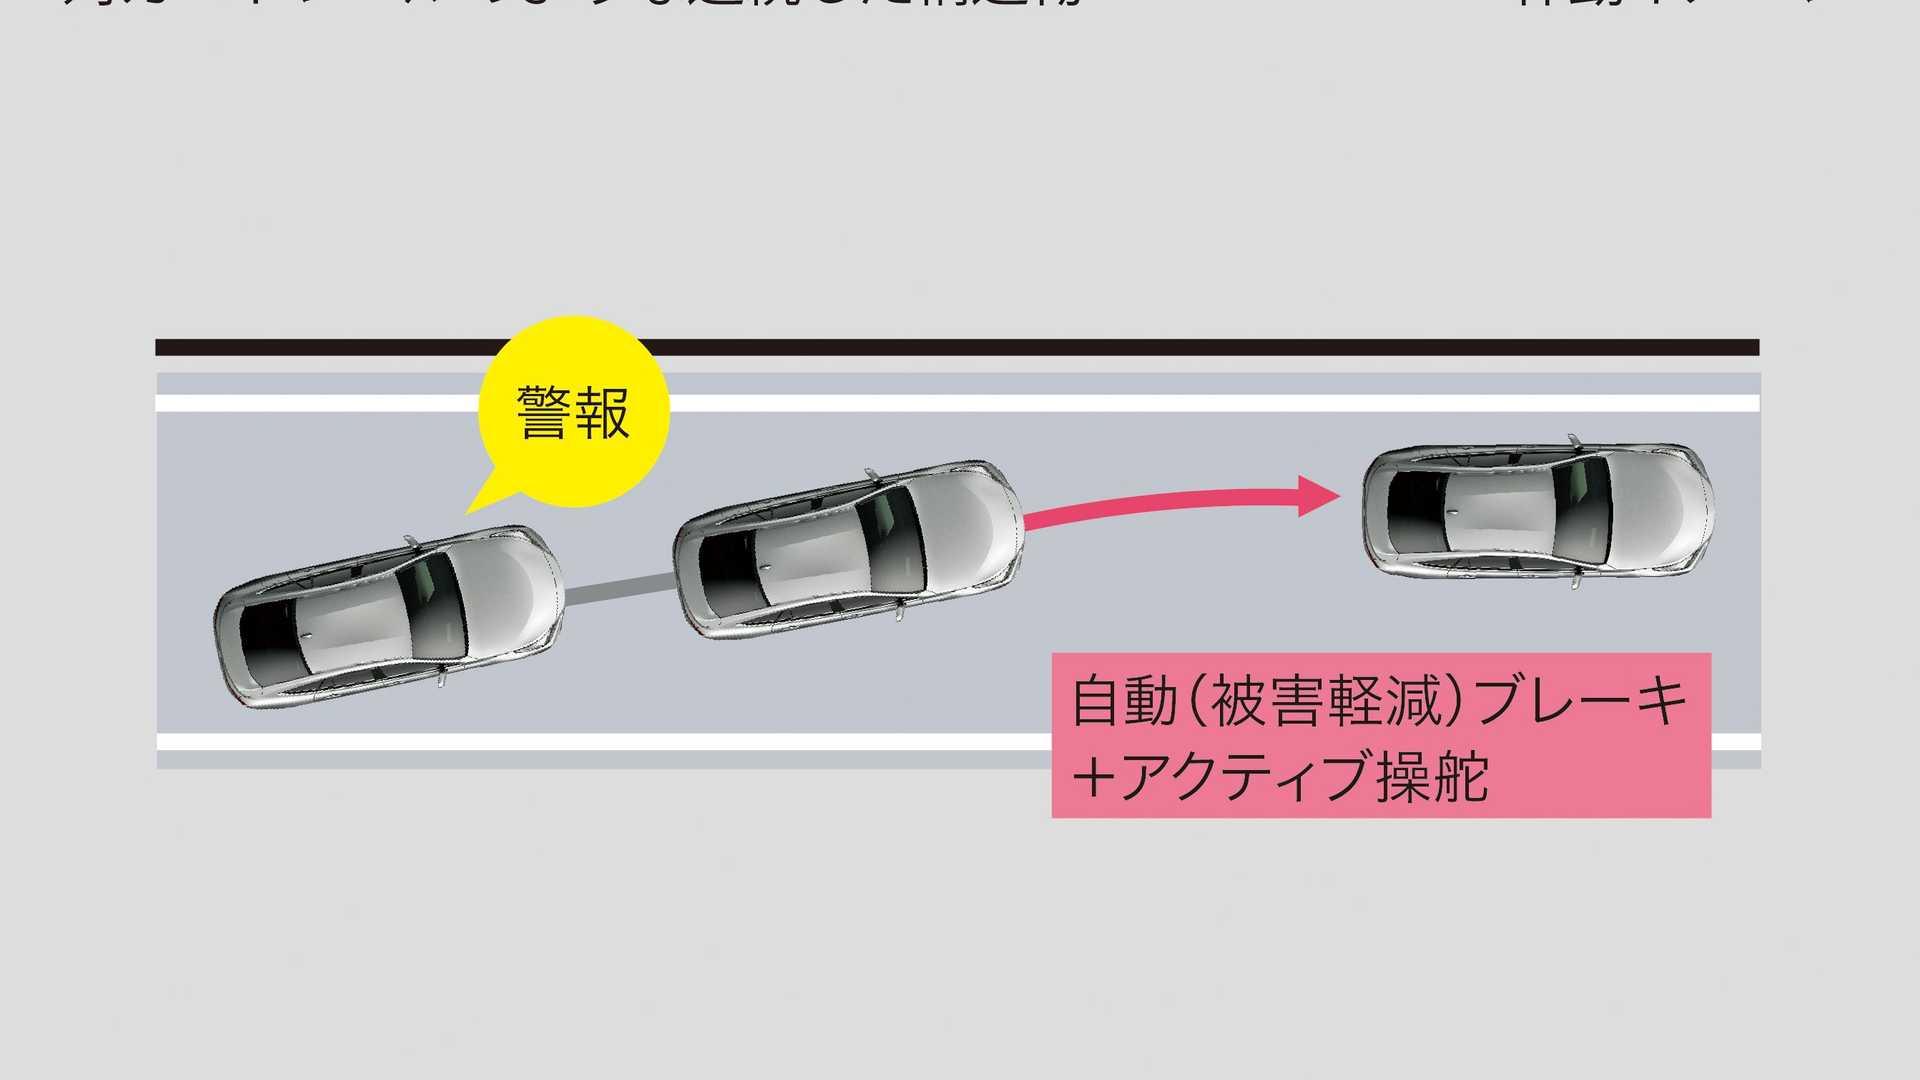 Lexus-LS-And-Toyota-Mirai-Advanced-Drive-38